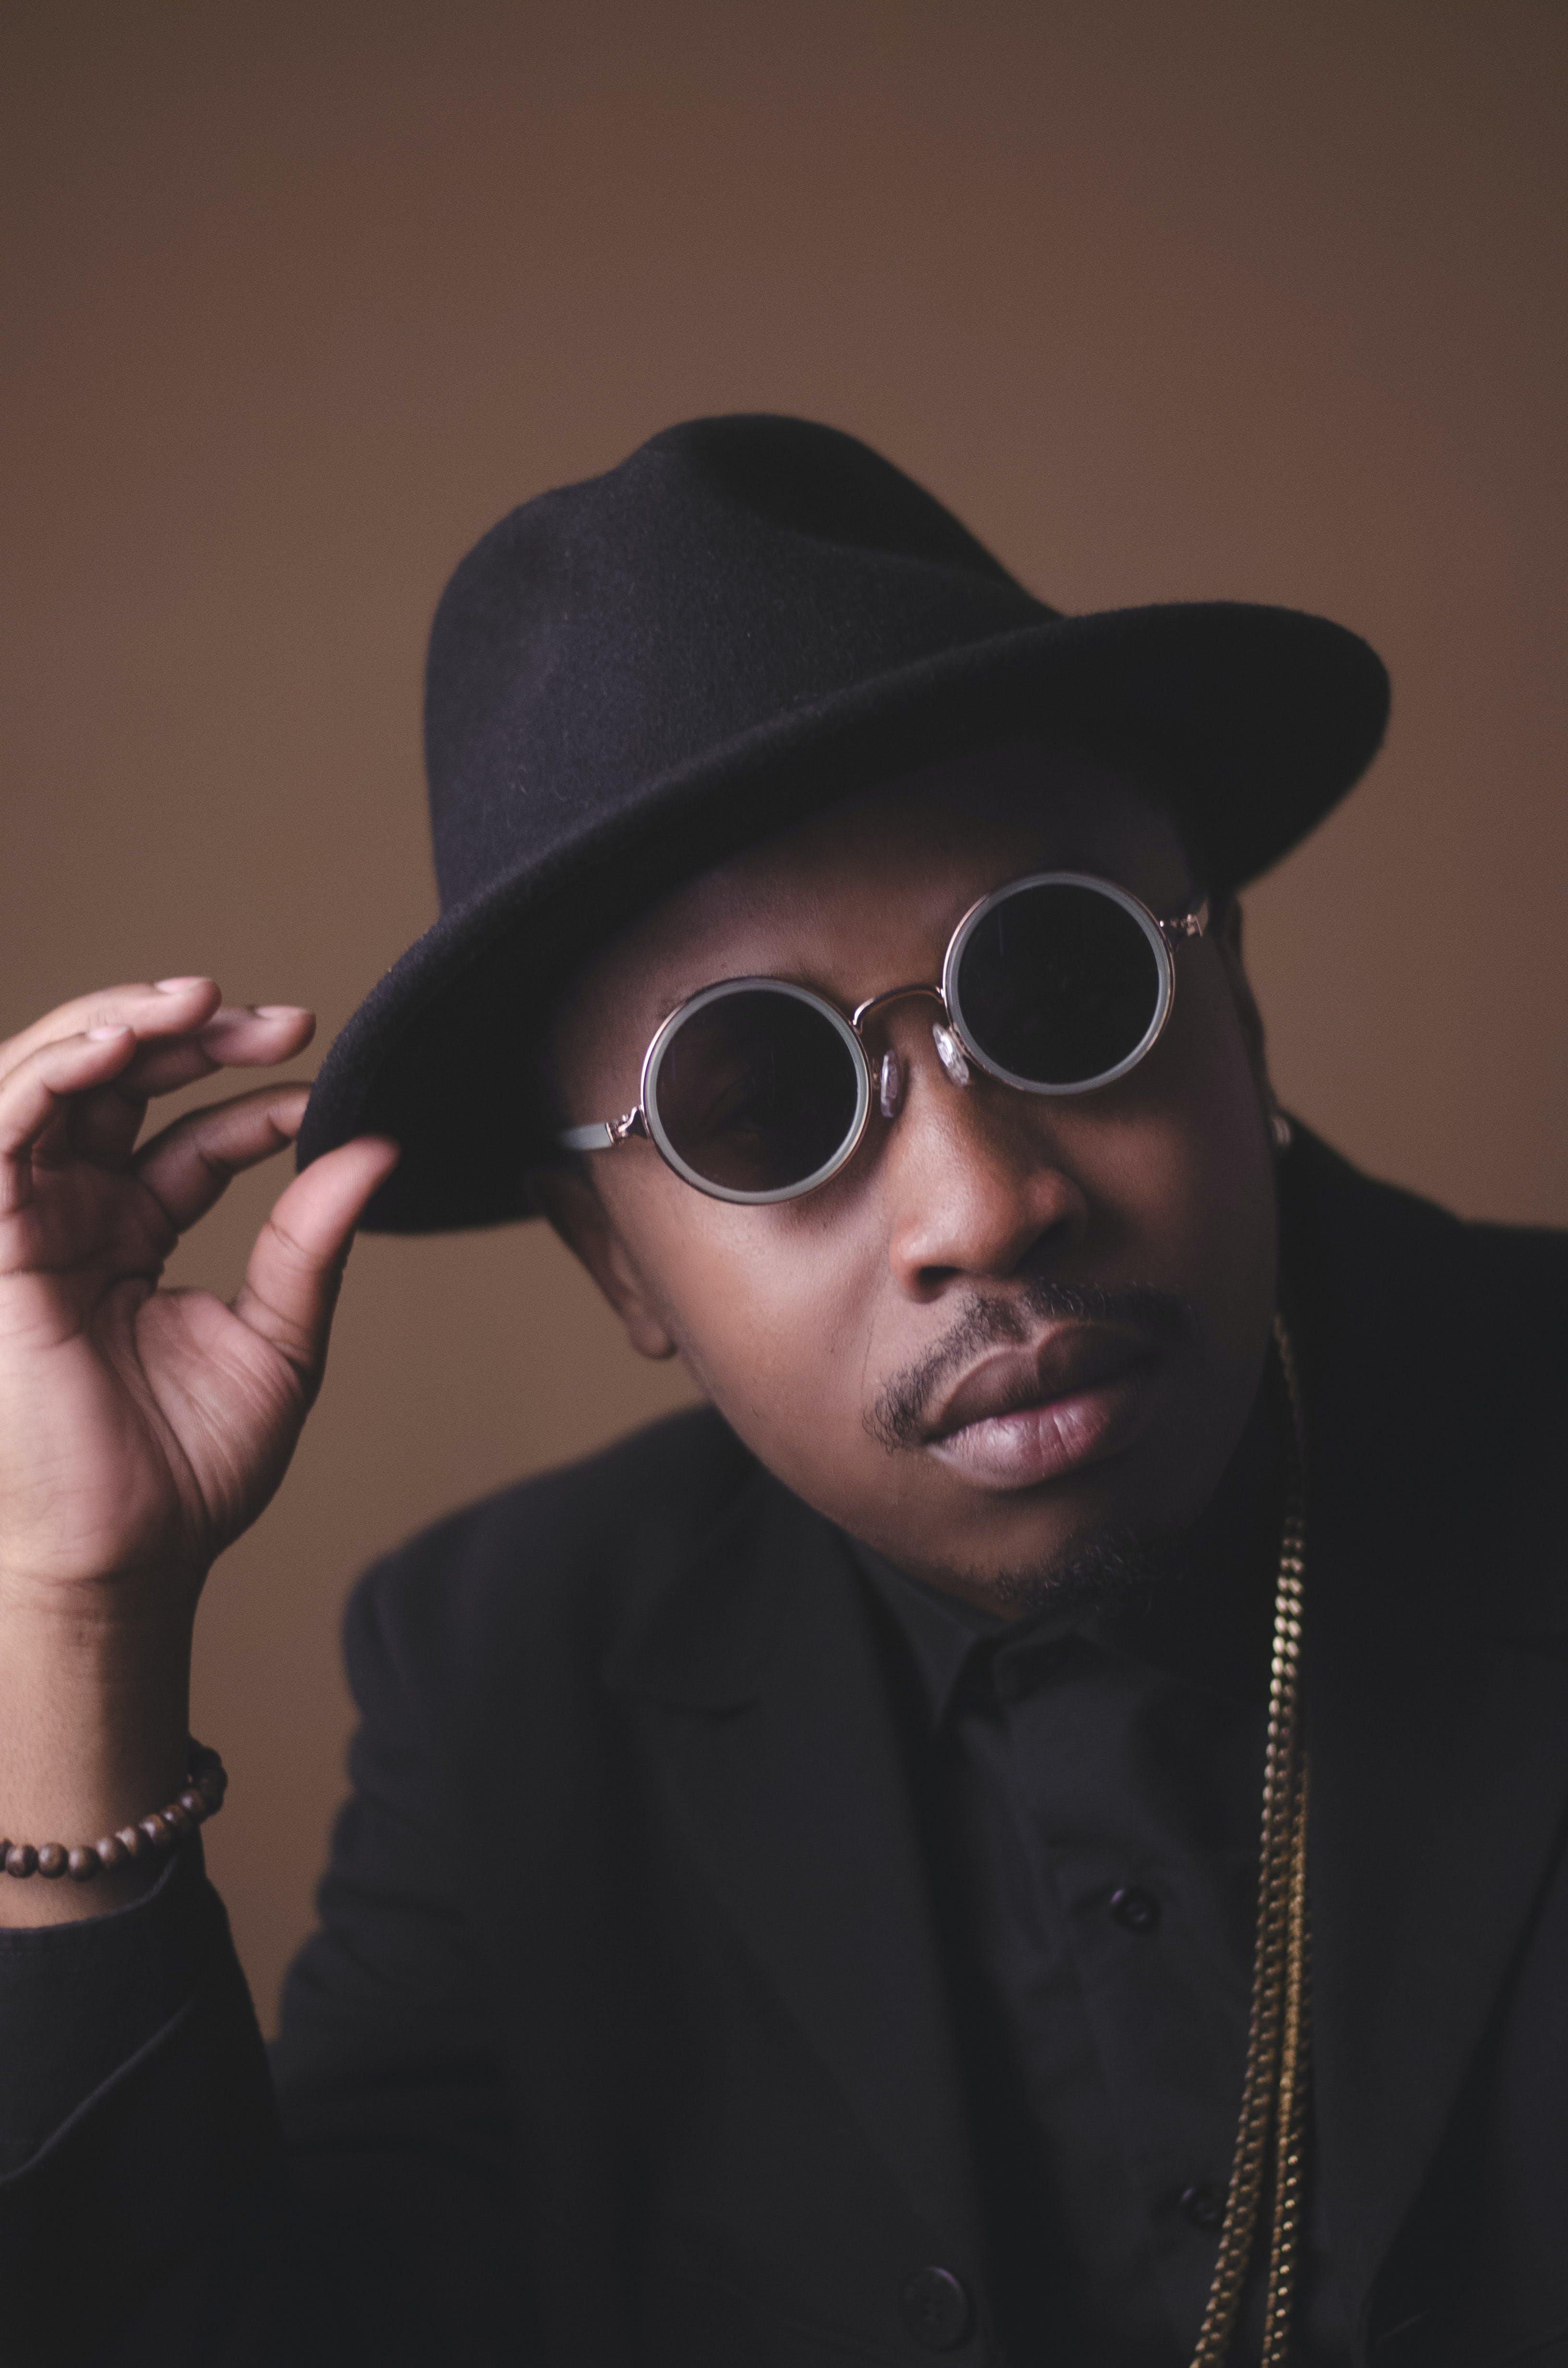 Man Holding Black Fedora Hat While Wearing Sunglasses